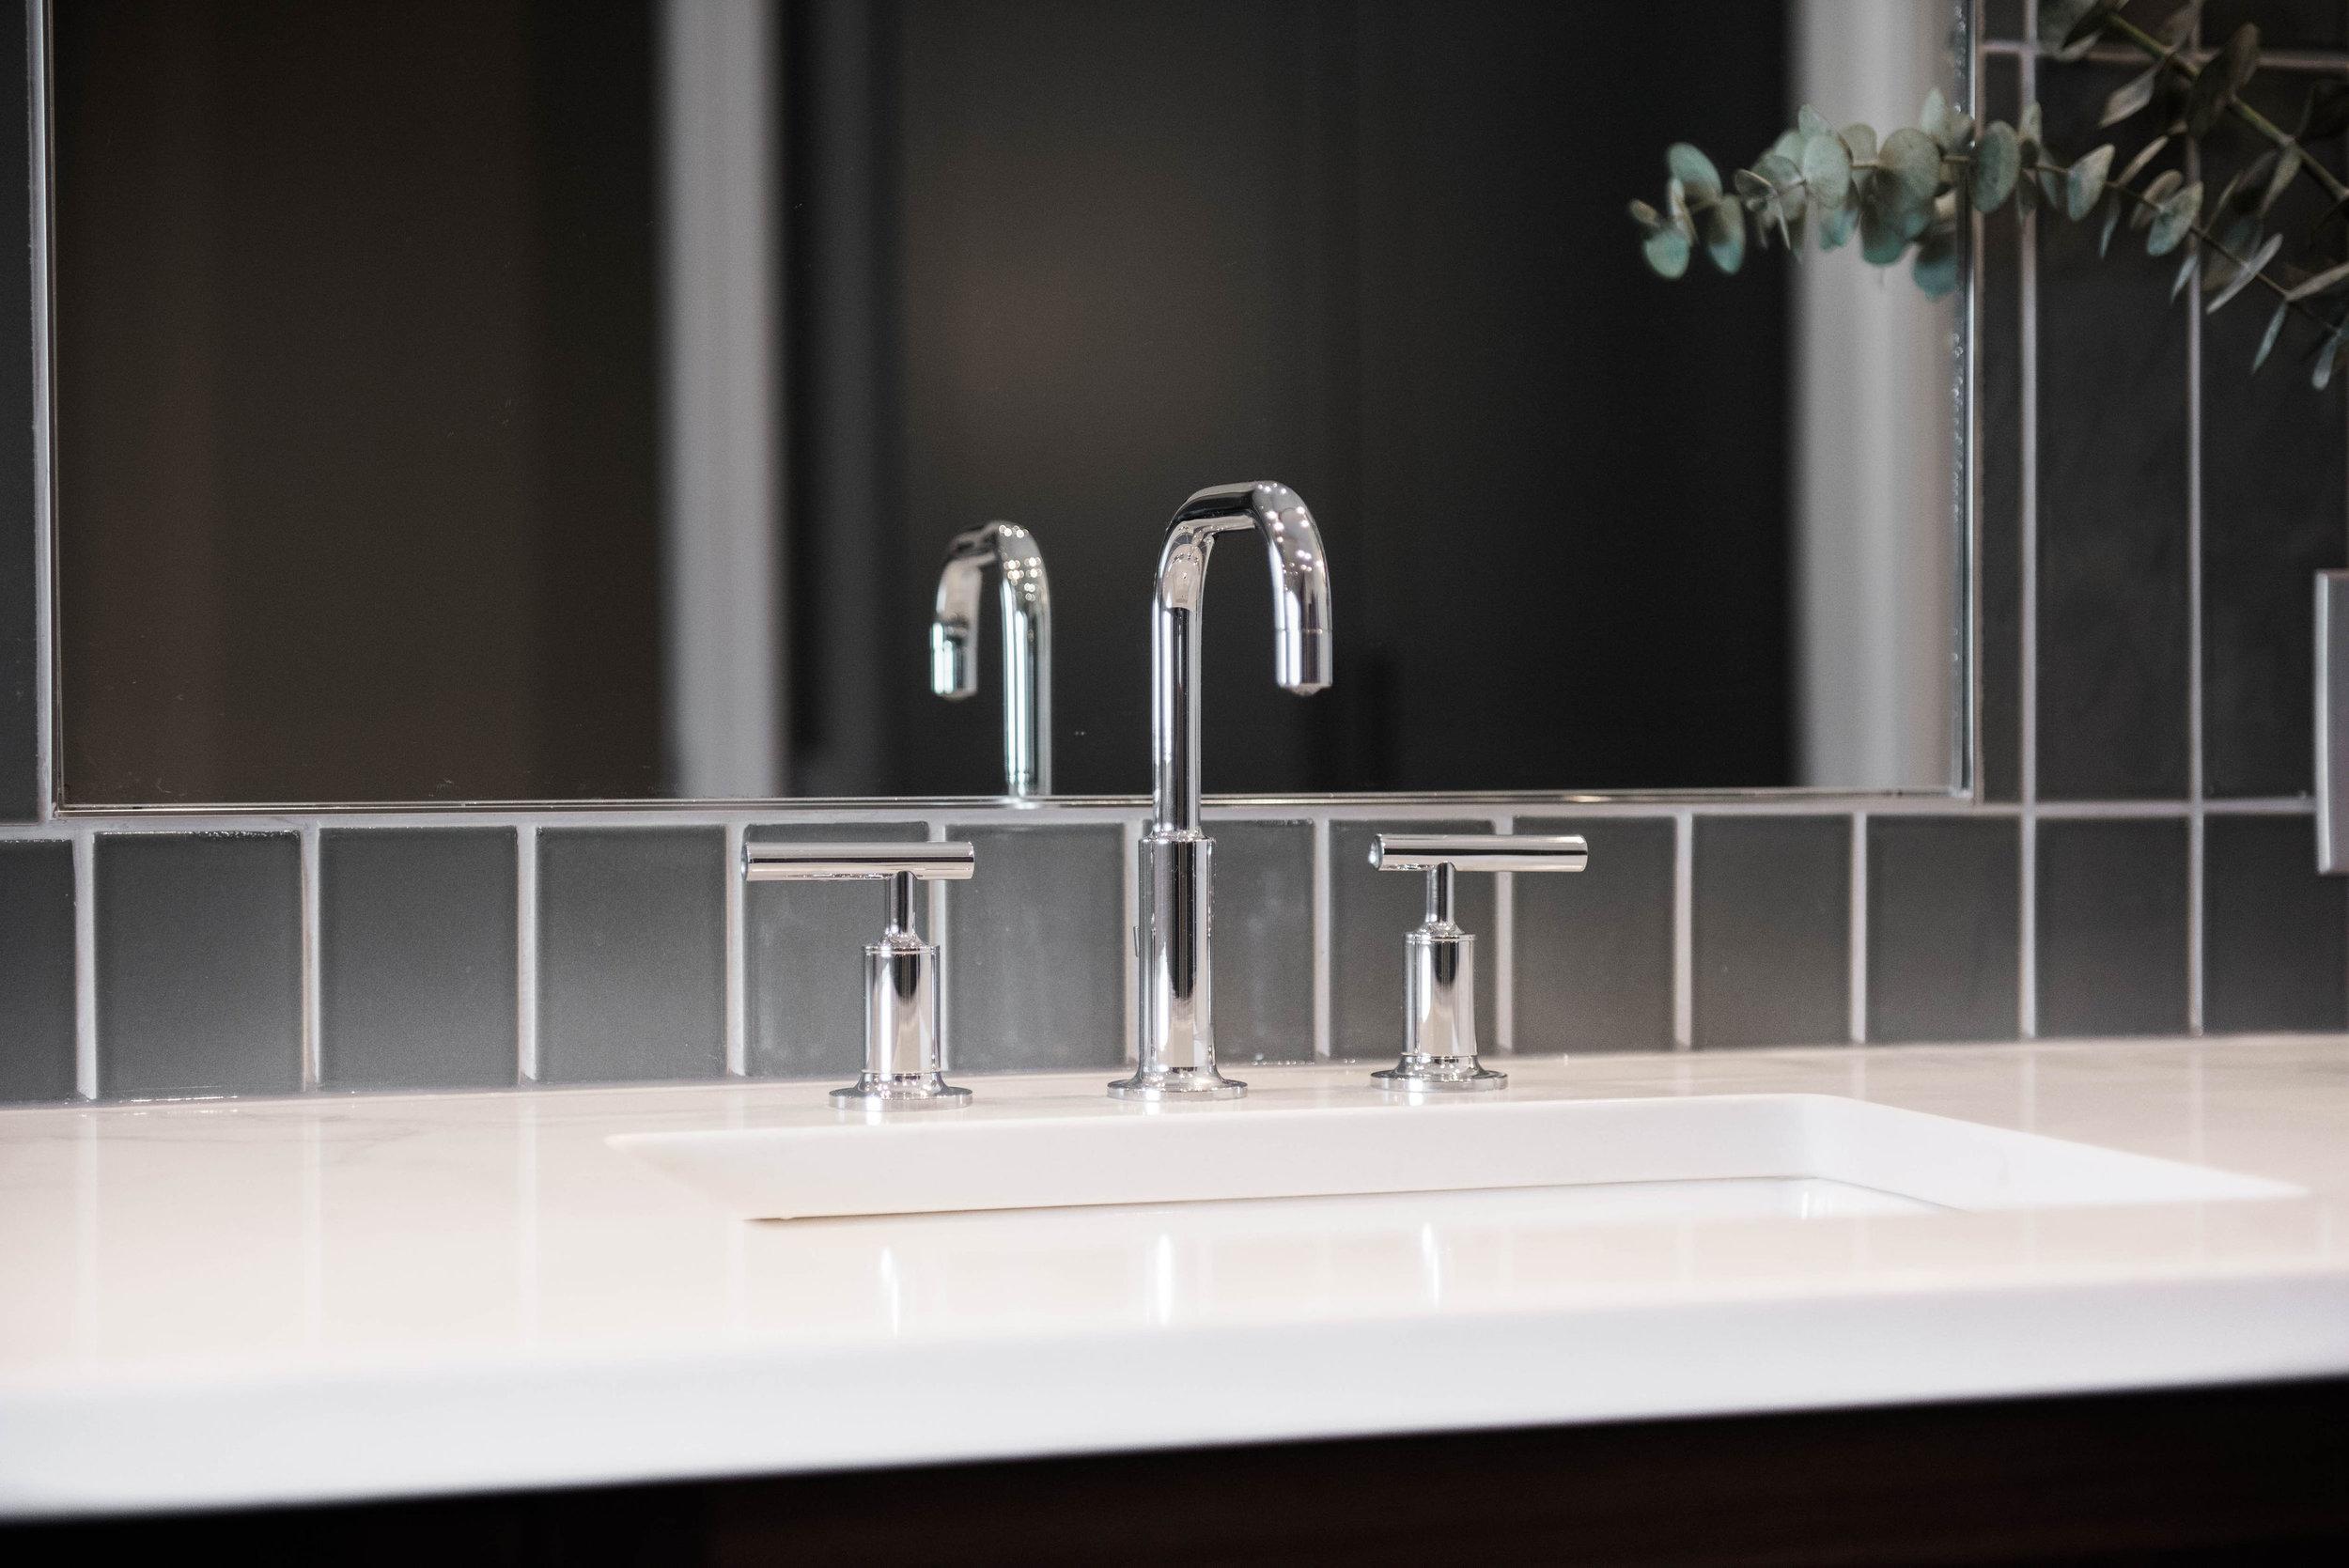 Kohler Purist faucet against Fireclay tile, classic!